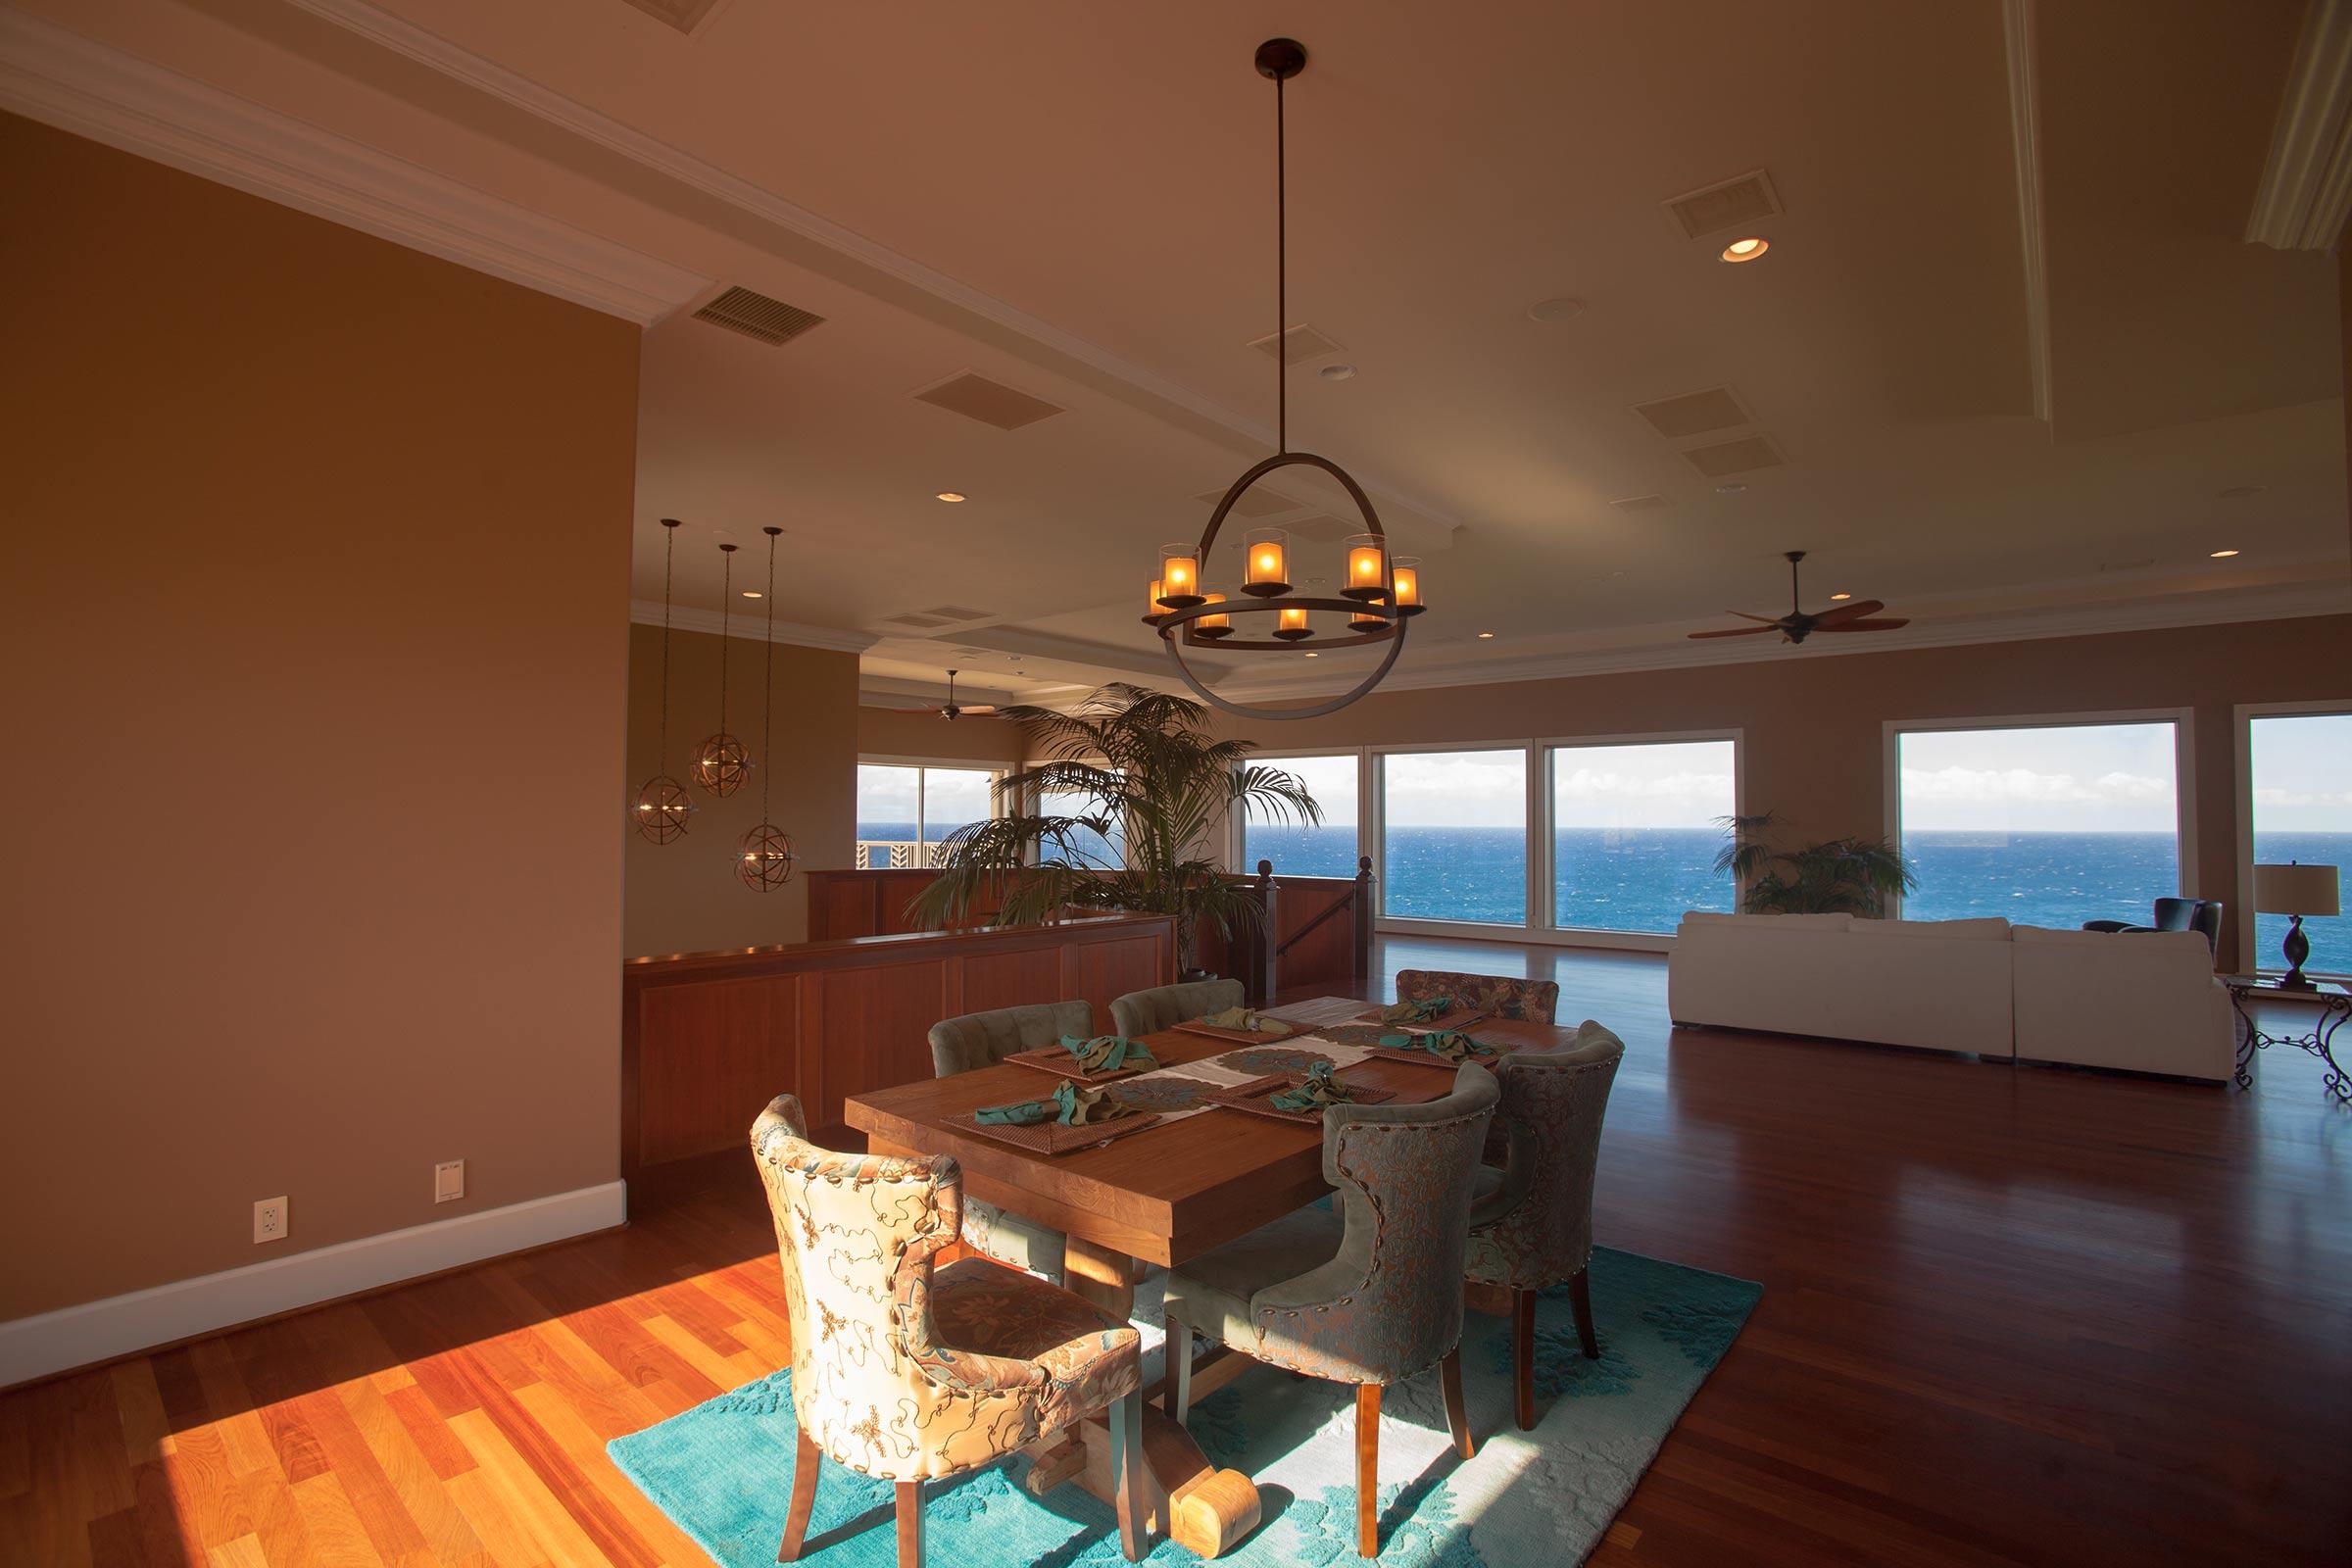 real-estate-photographer-028.jpg